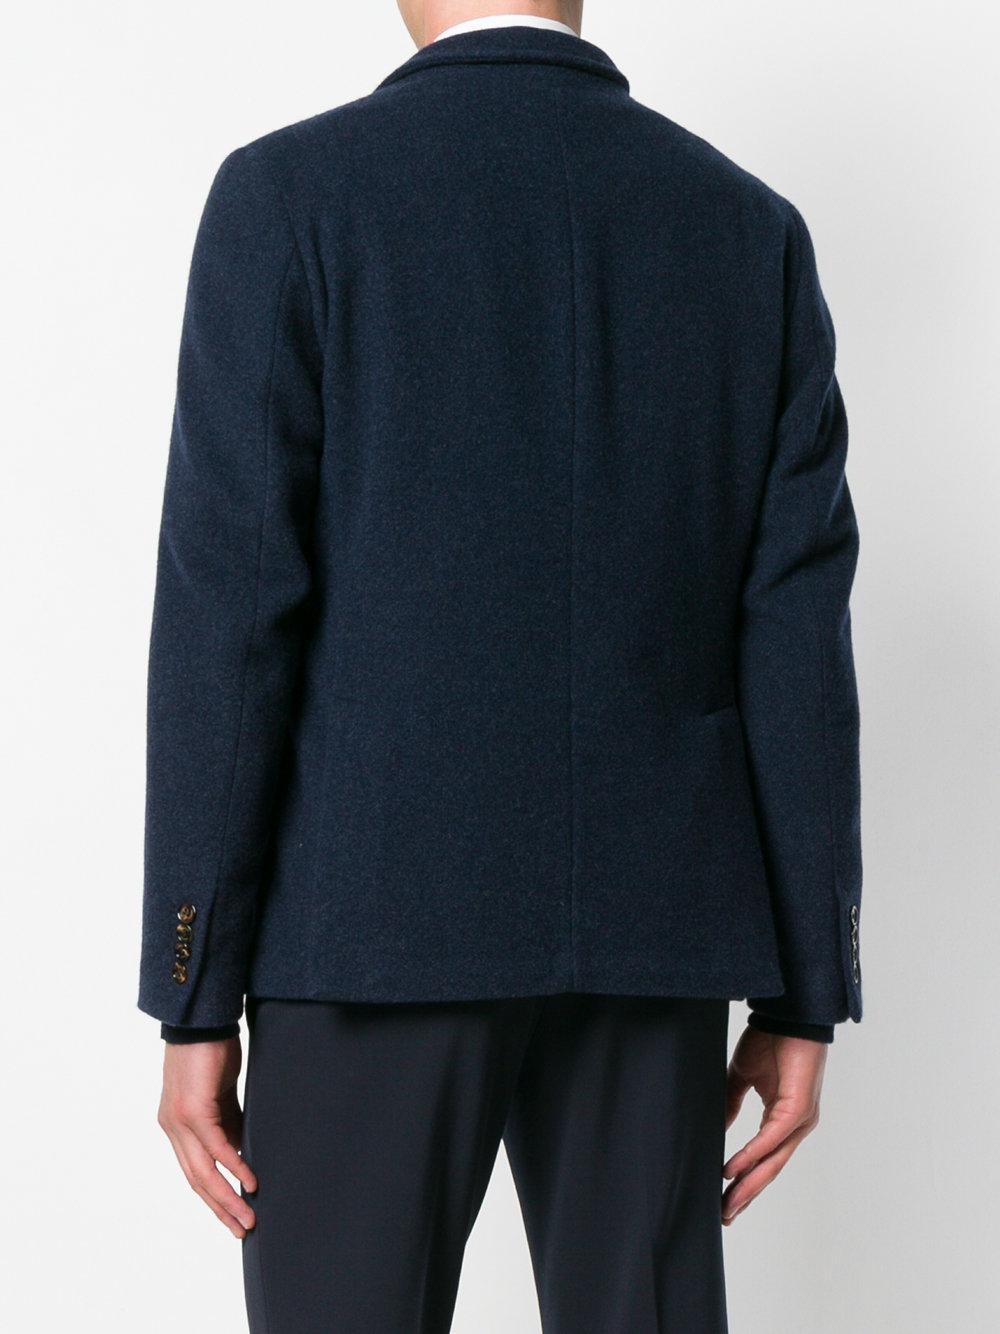 Eleventy Cashmere Blazer Jacket in Blue for Men